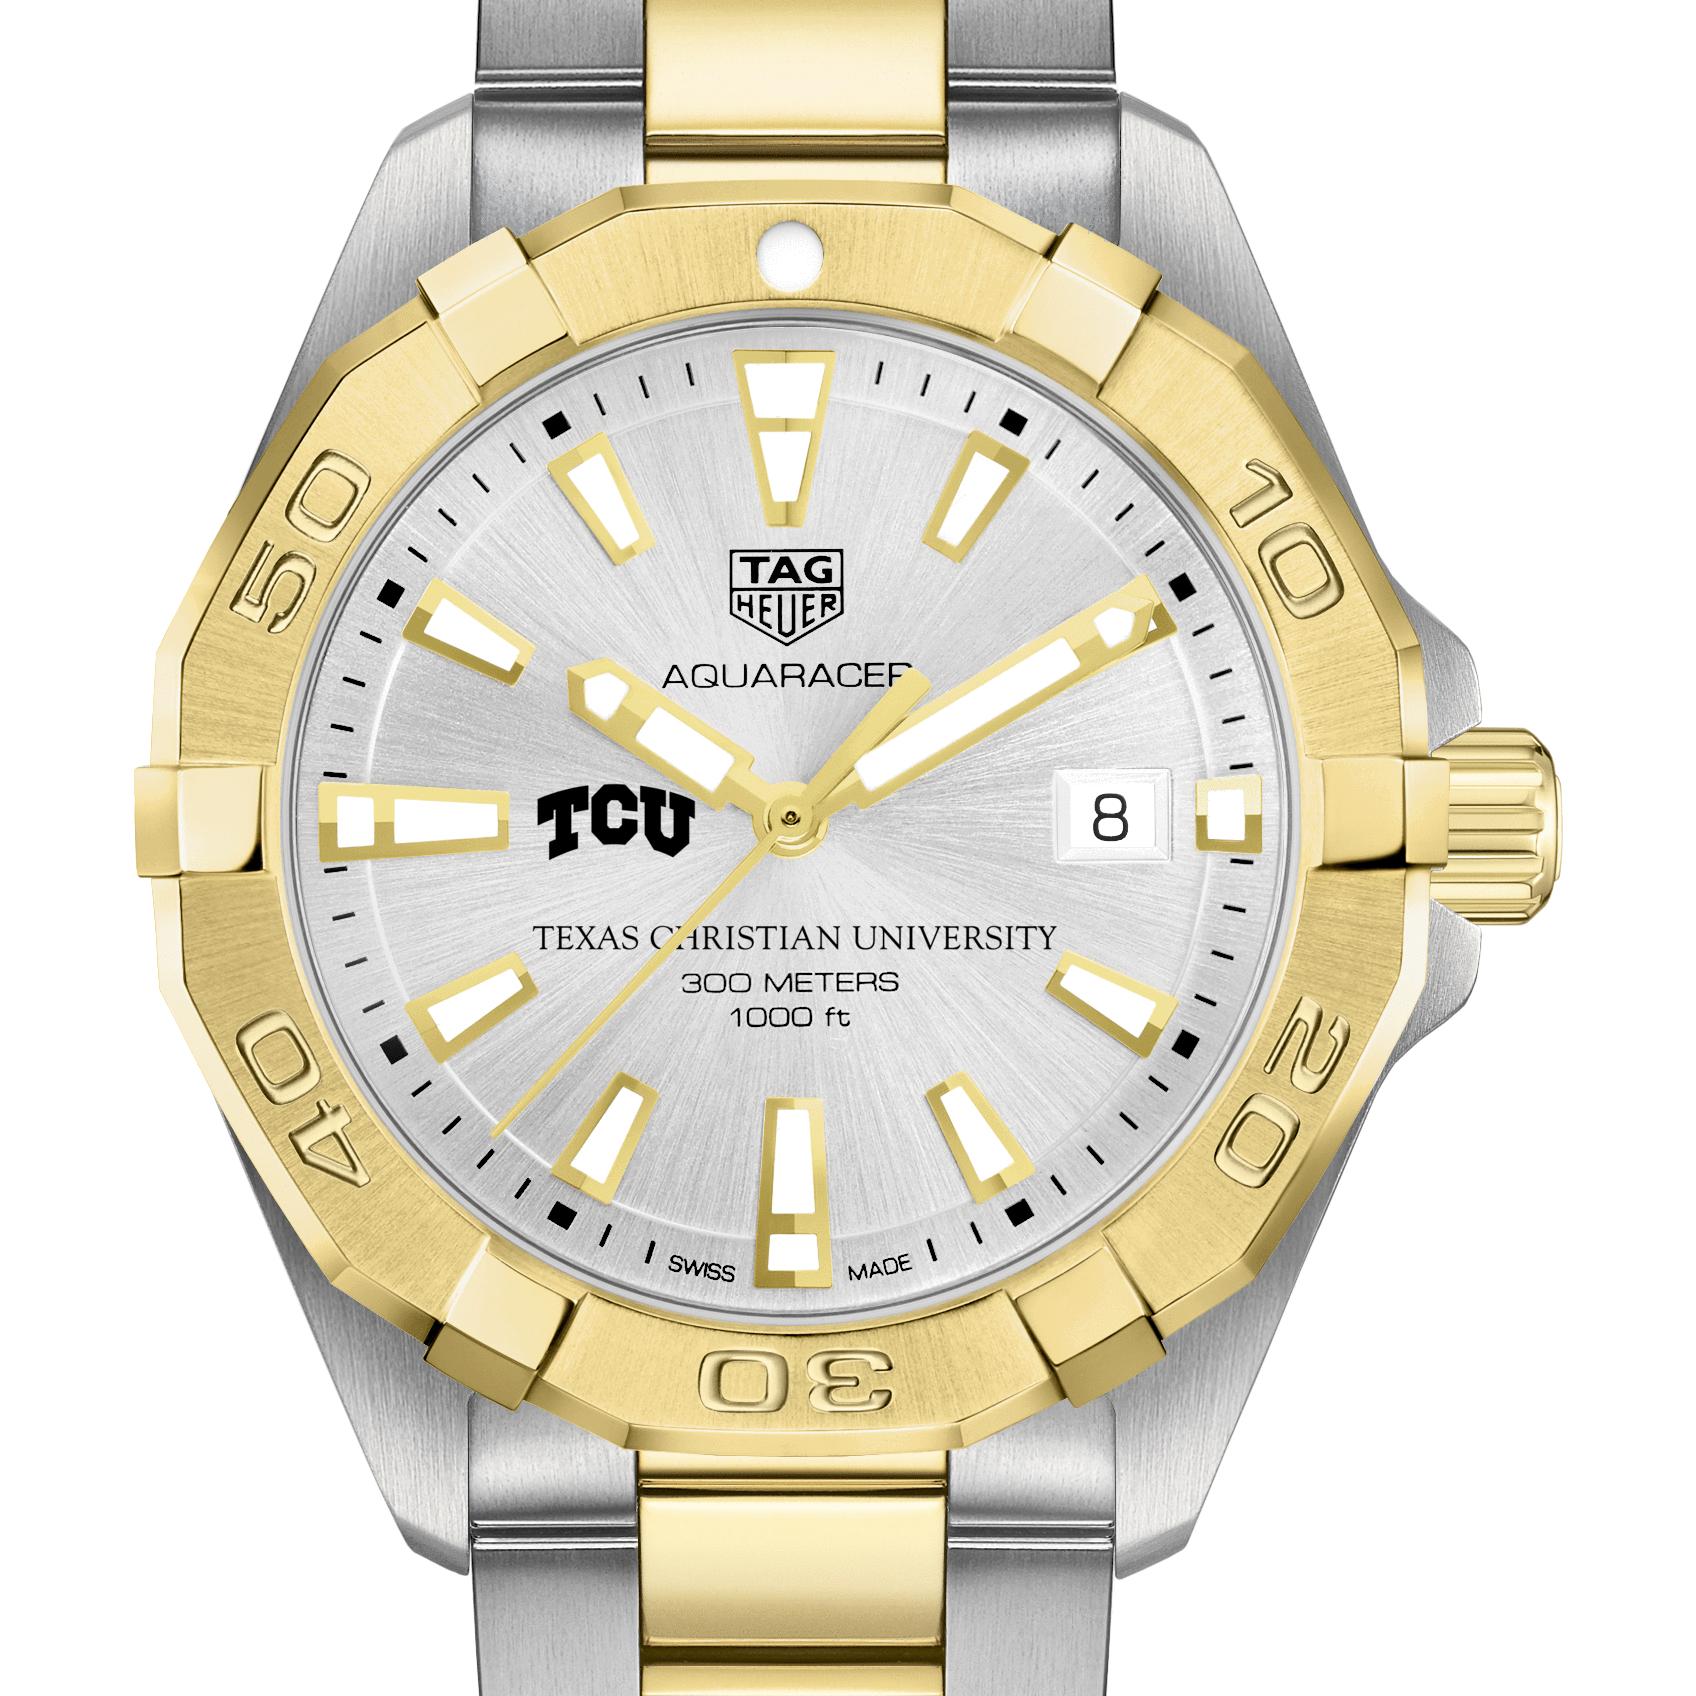 TCU Men's TAG Heuer Two-Tone Aquaracer